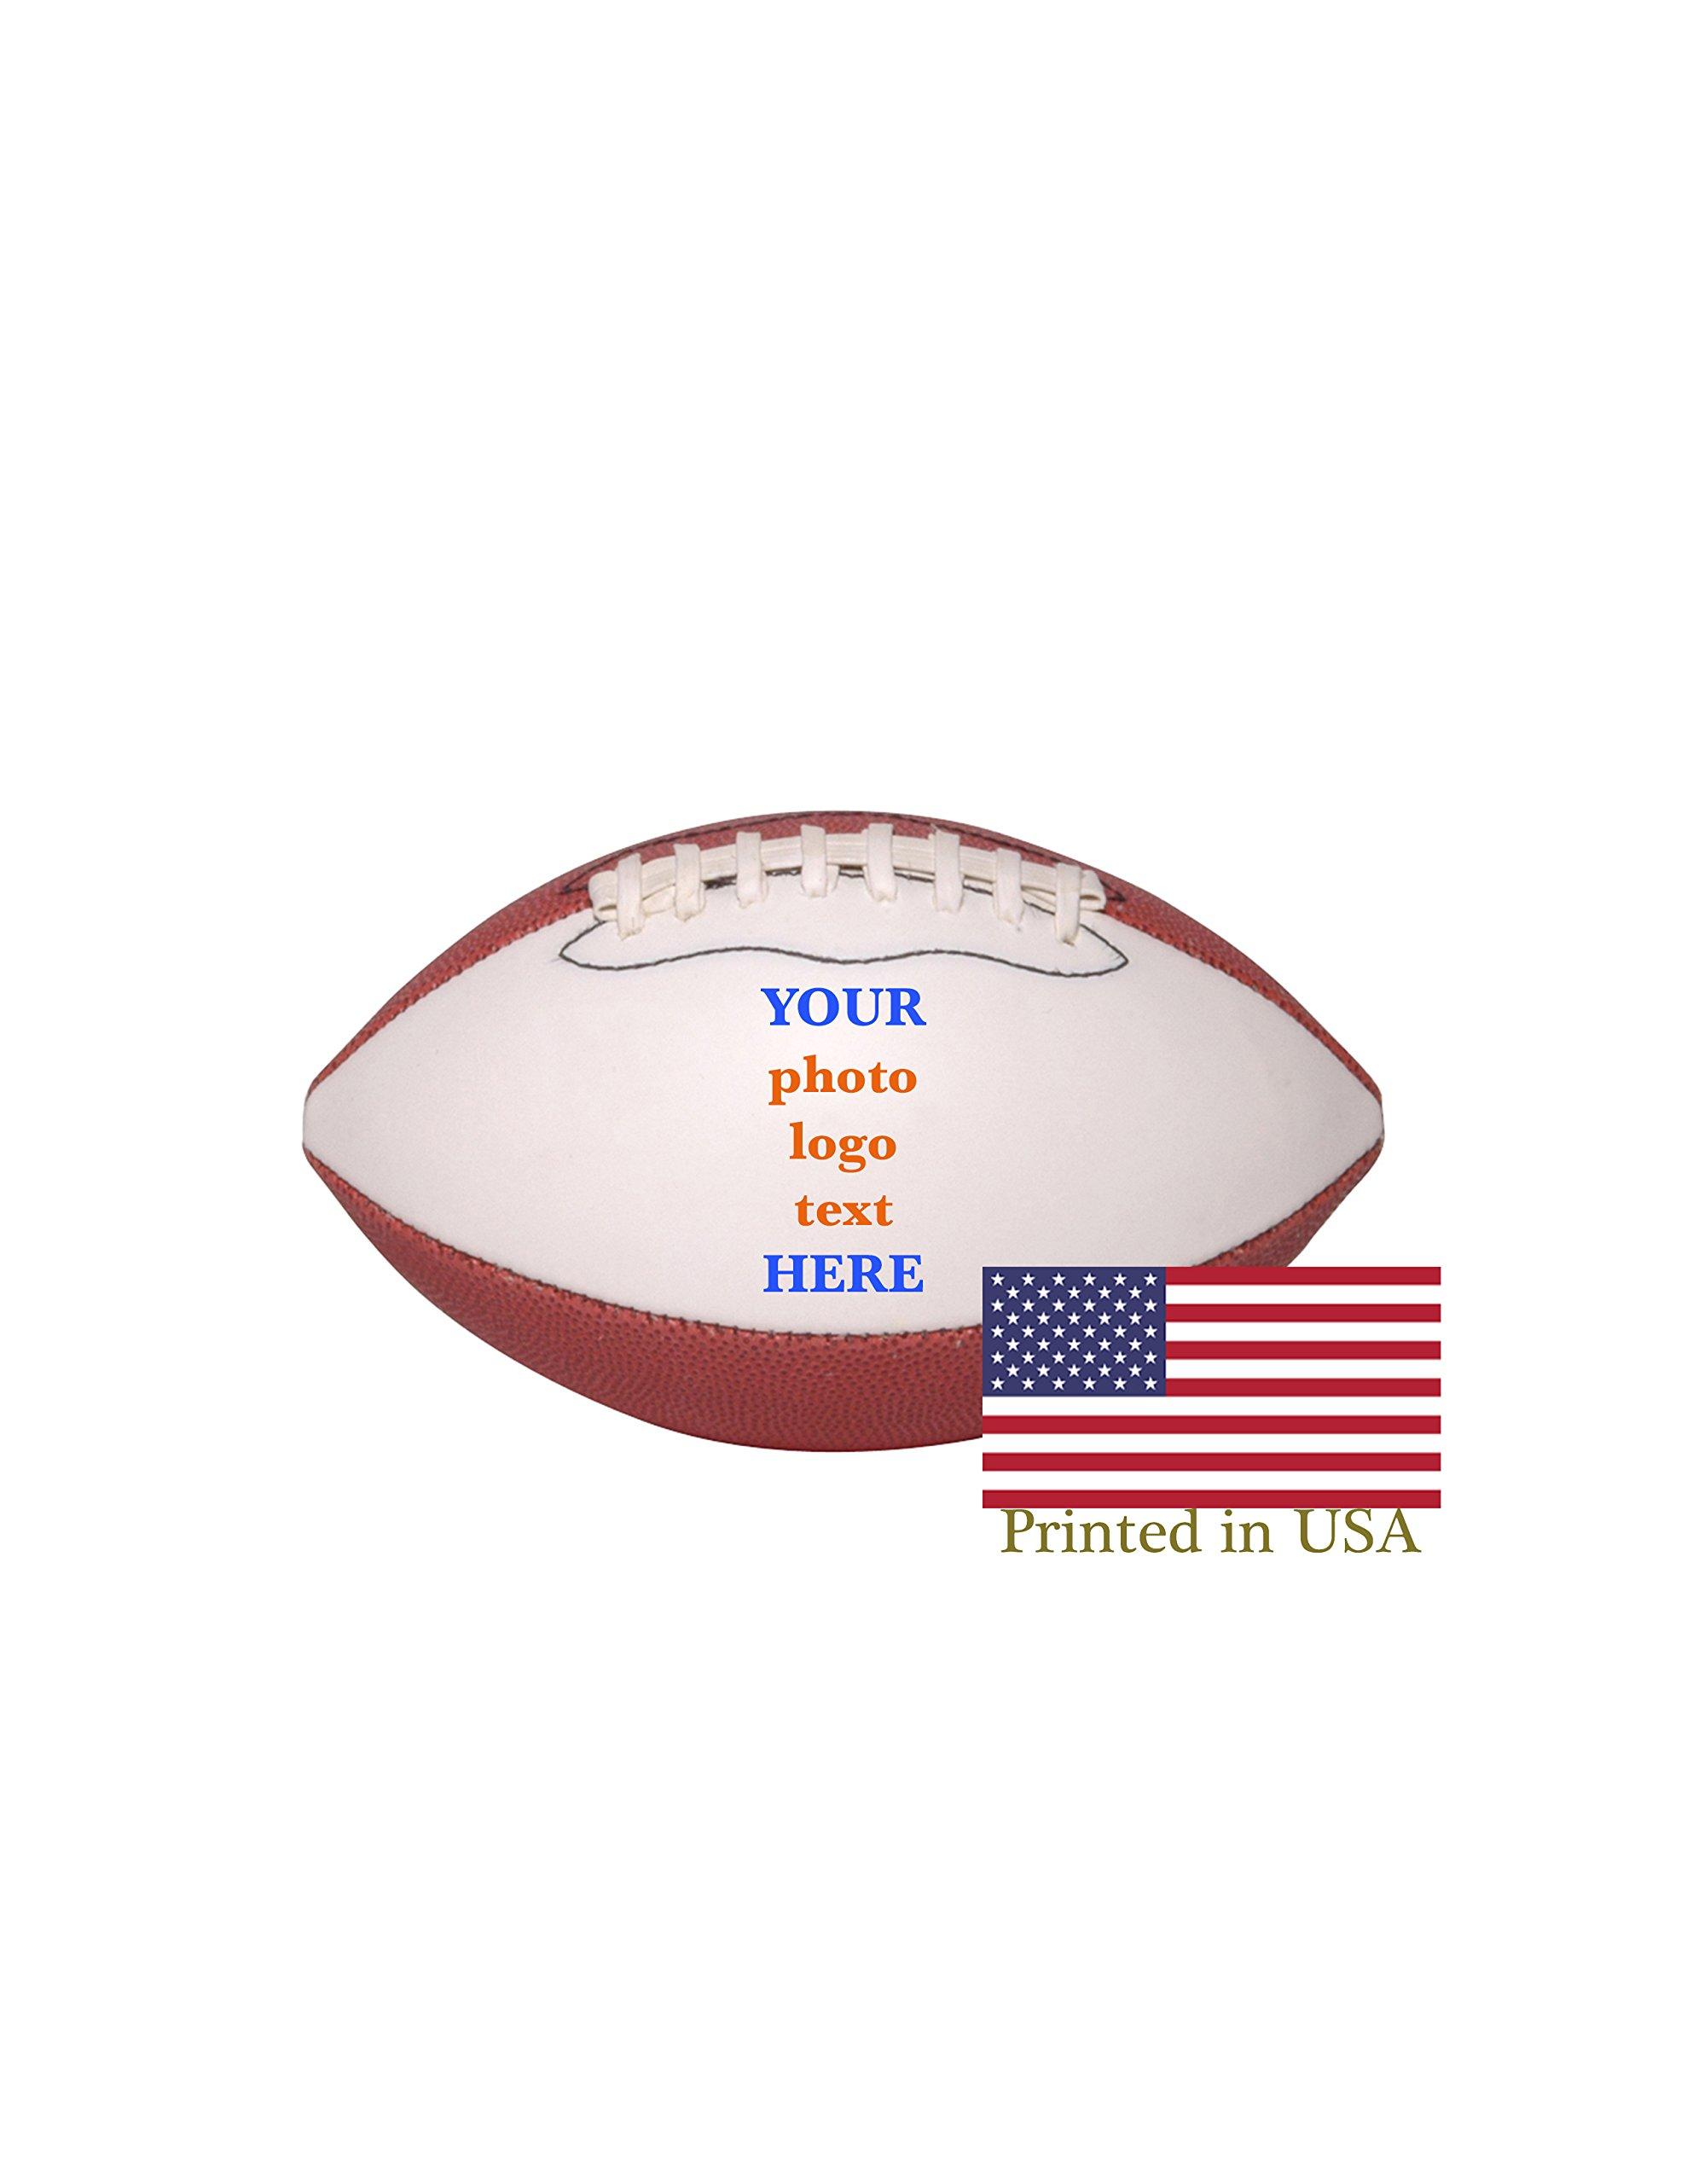 Custom Personalized Mini Football 6 Inch Football Shipped Next Day, High Resolution Photos, Logos & Text on Football Balls Trophies, Personalized Gifts